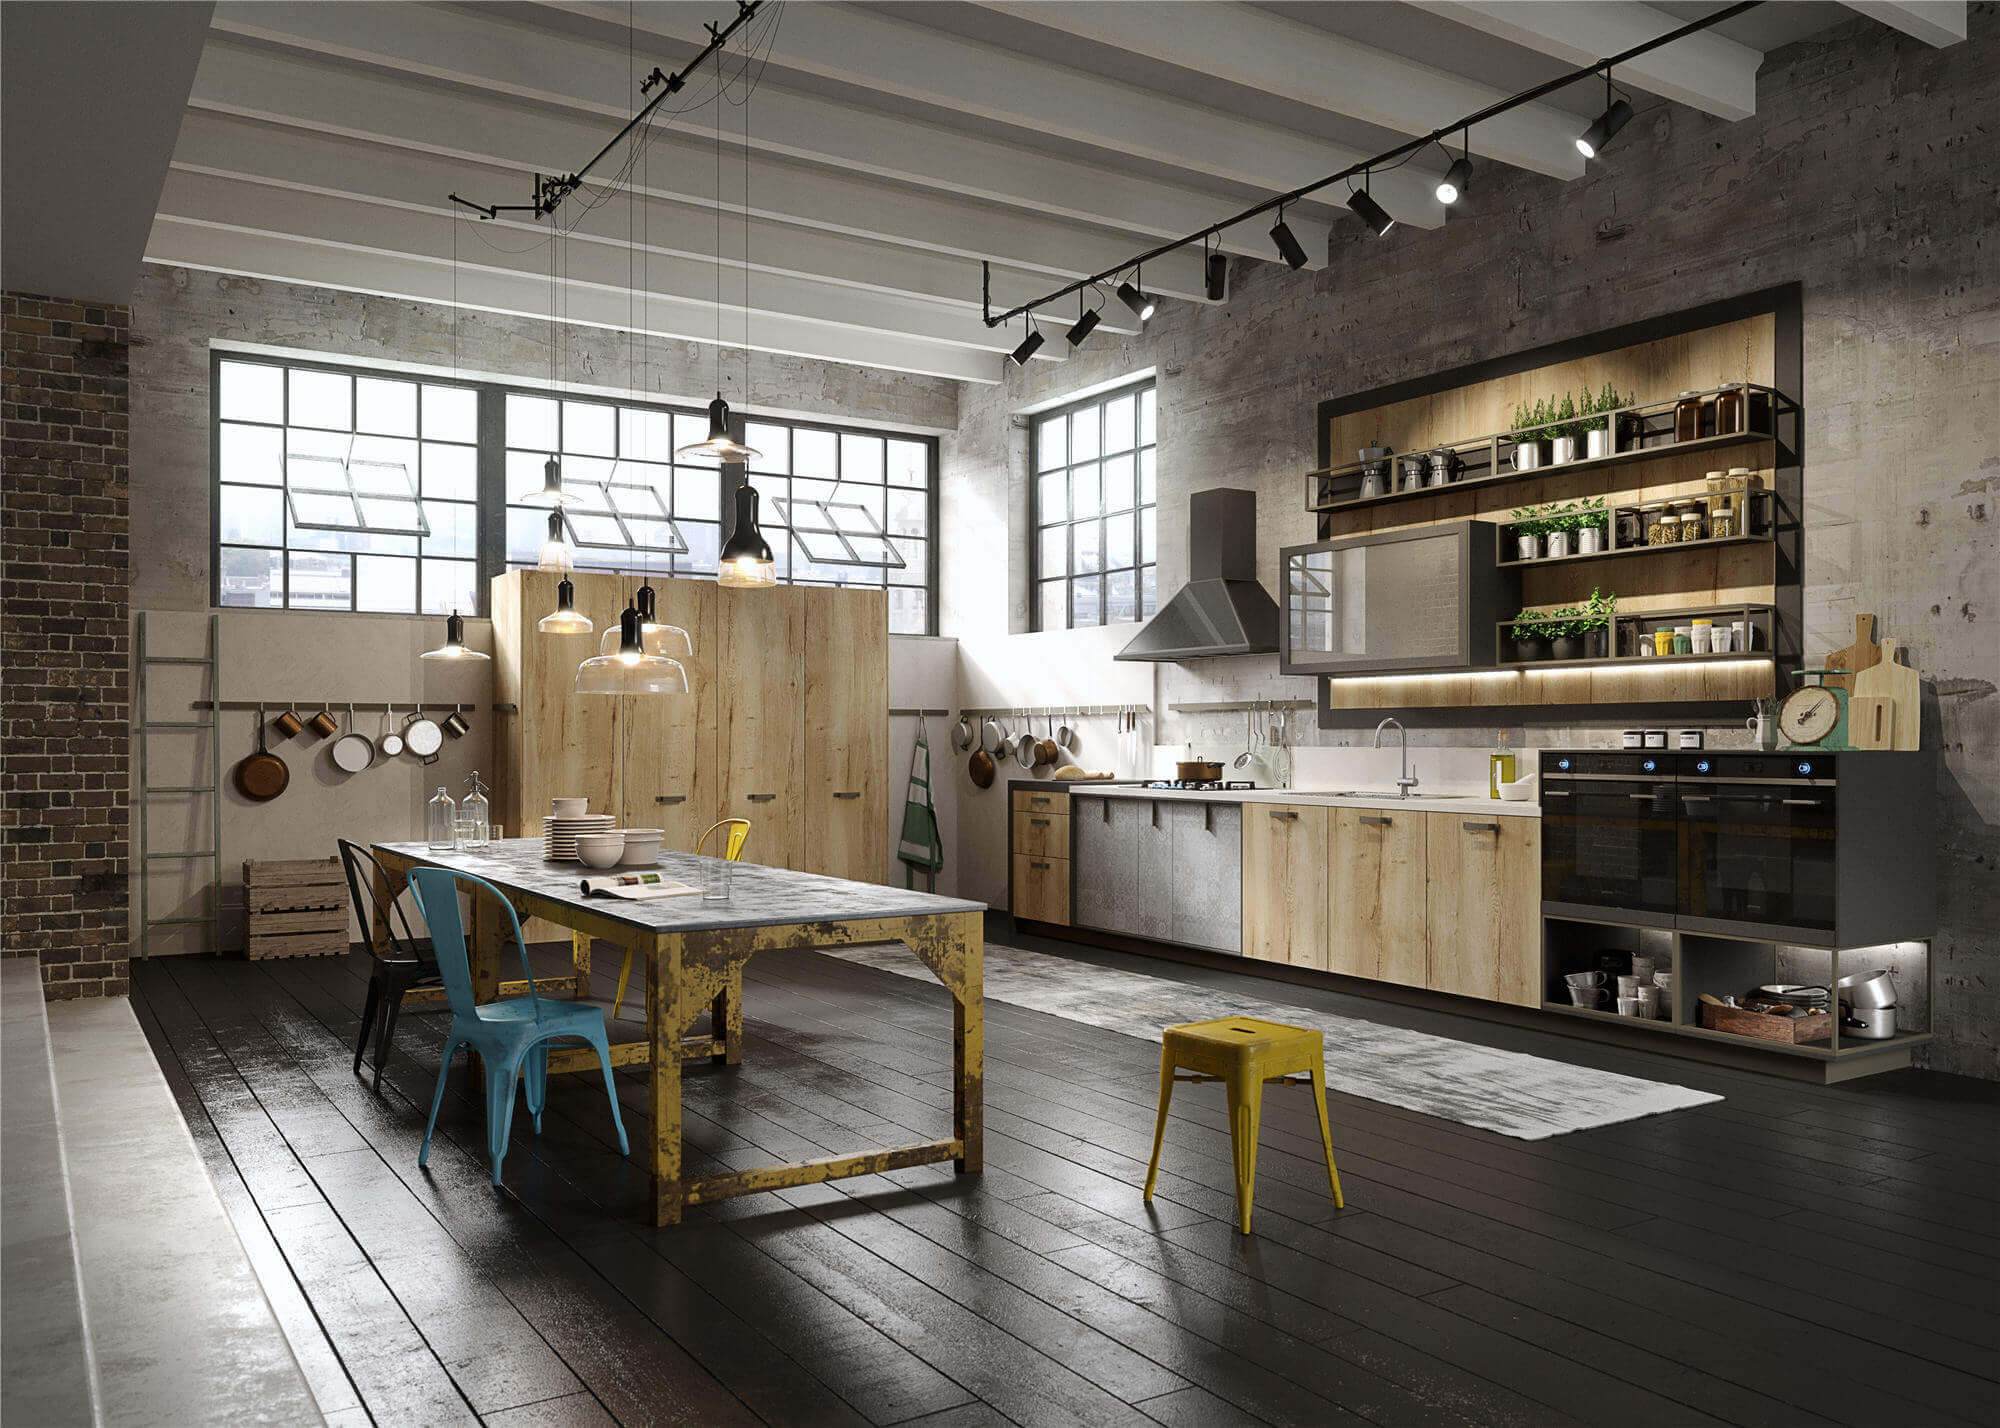 Open industriële keuken